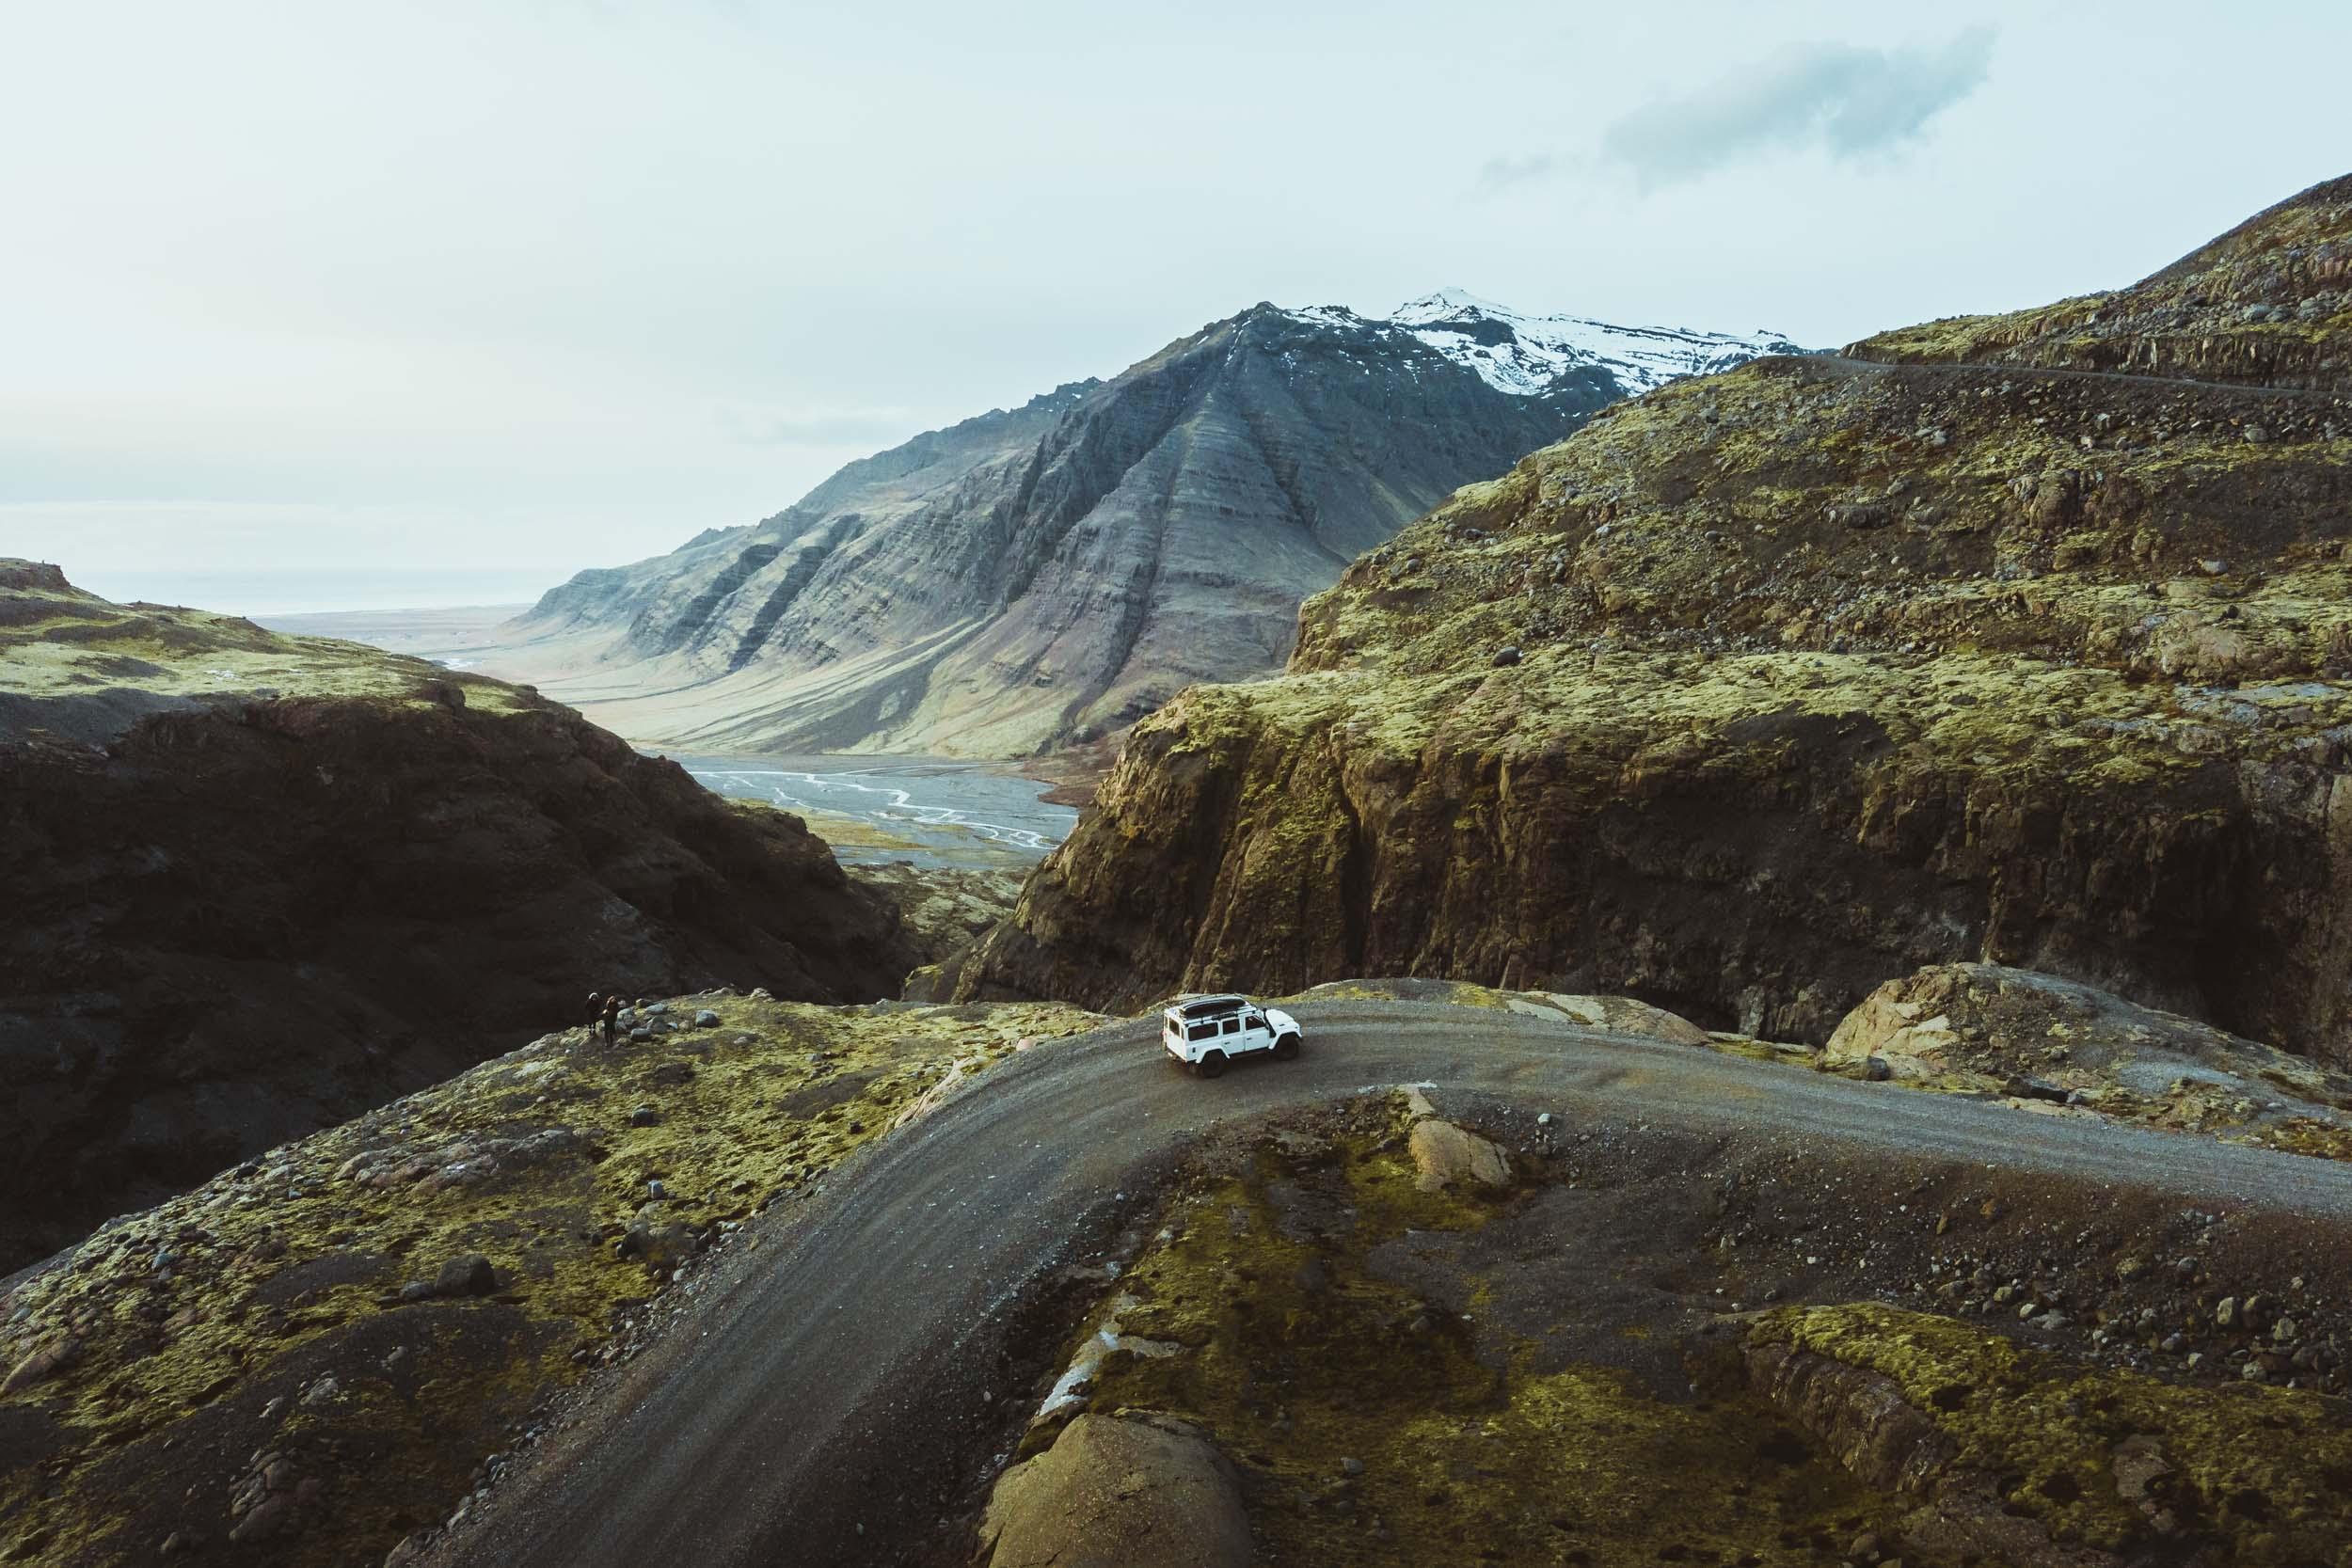 Iceland_Jan_2019_ByTomKahler_Lowres (1 of 1).jpg